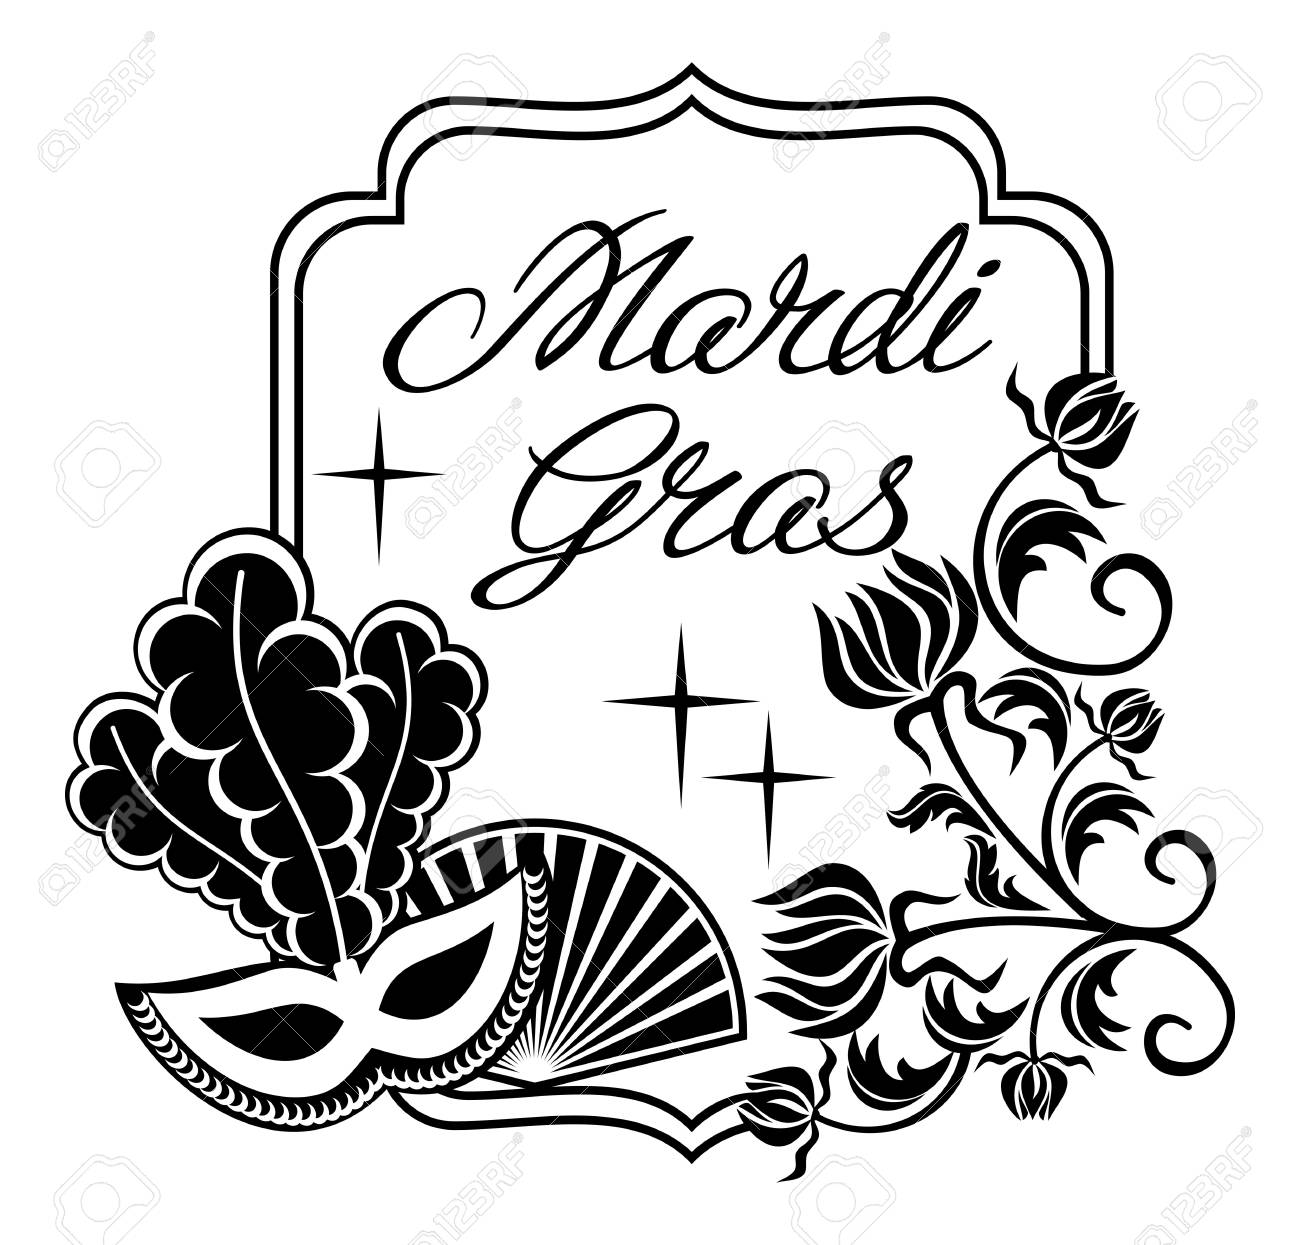 Black Line Clip Art Mardi Gras Wiring Diagrams Onan Diagram 6126628 And White Silhouette Frame With Carnival Masks Artistic Rh 123rf Com Cartoon Crown